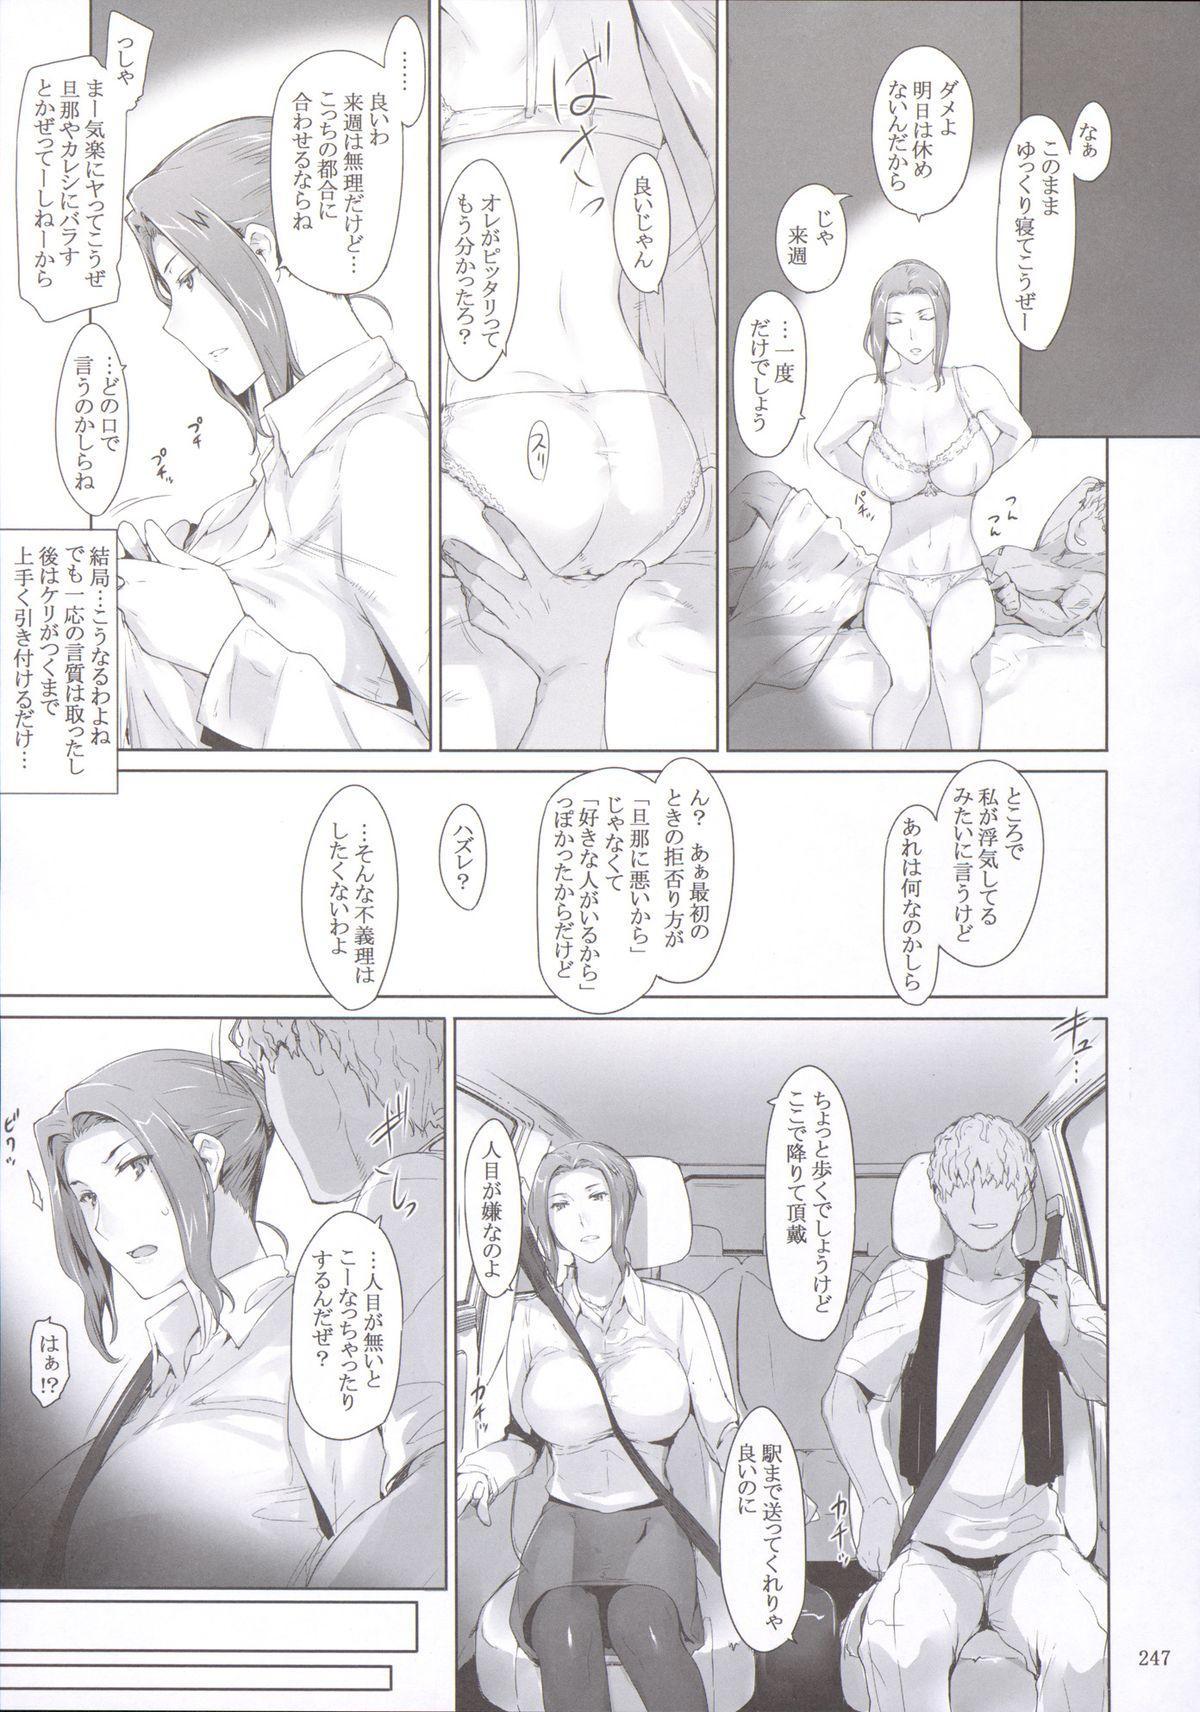 (C86) [MTSP (Jin)] Tachibana-san-chi no Dansei Jijou Matome Ban [Incomplete] 45